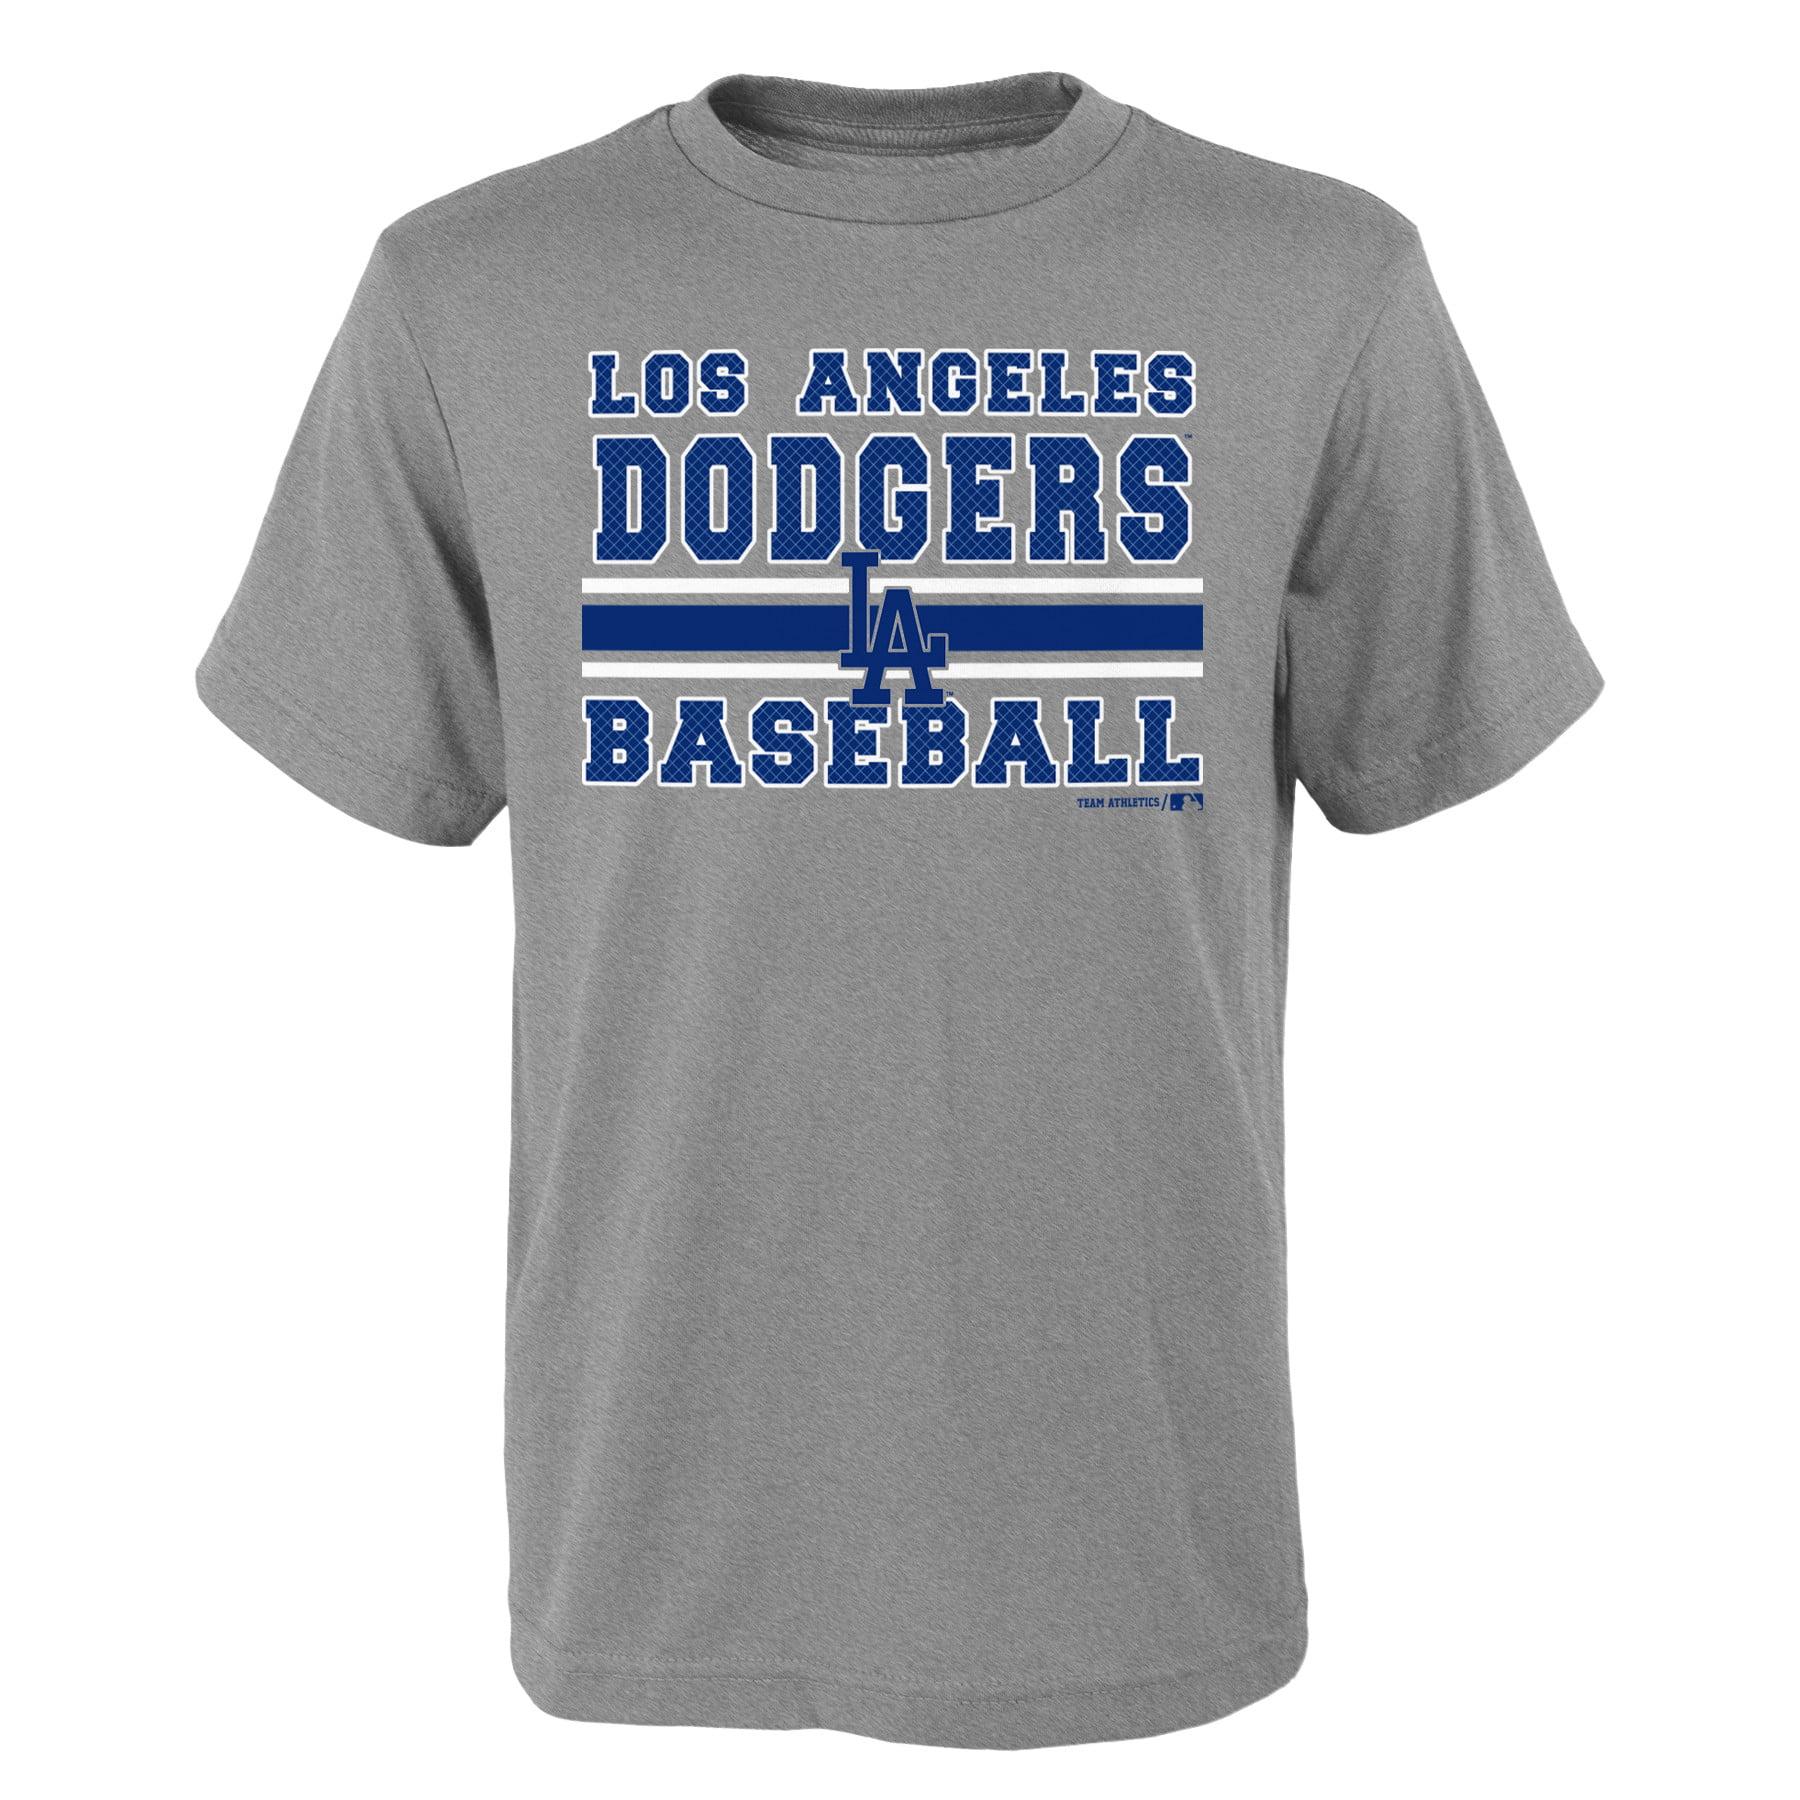 MLB Los Angeles DODGERS TEE Short Sleeve Boys OPP 90% Cotton 10% Polyester Gray Team Tee 4-18